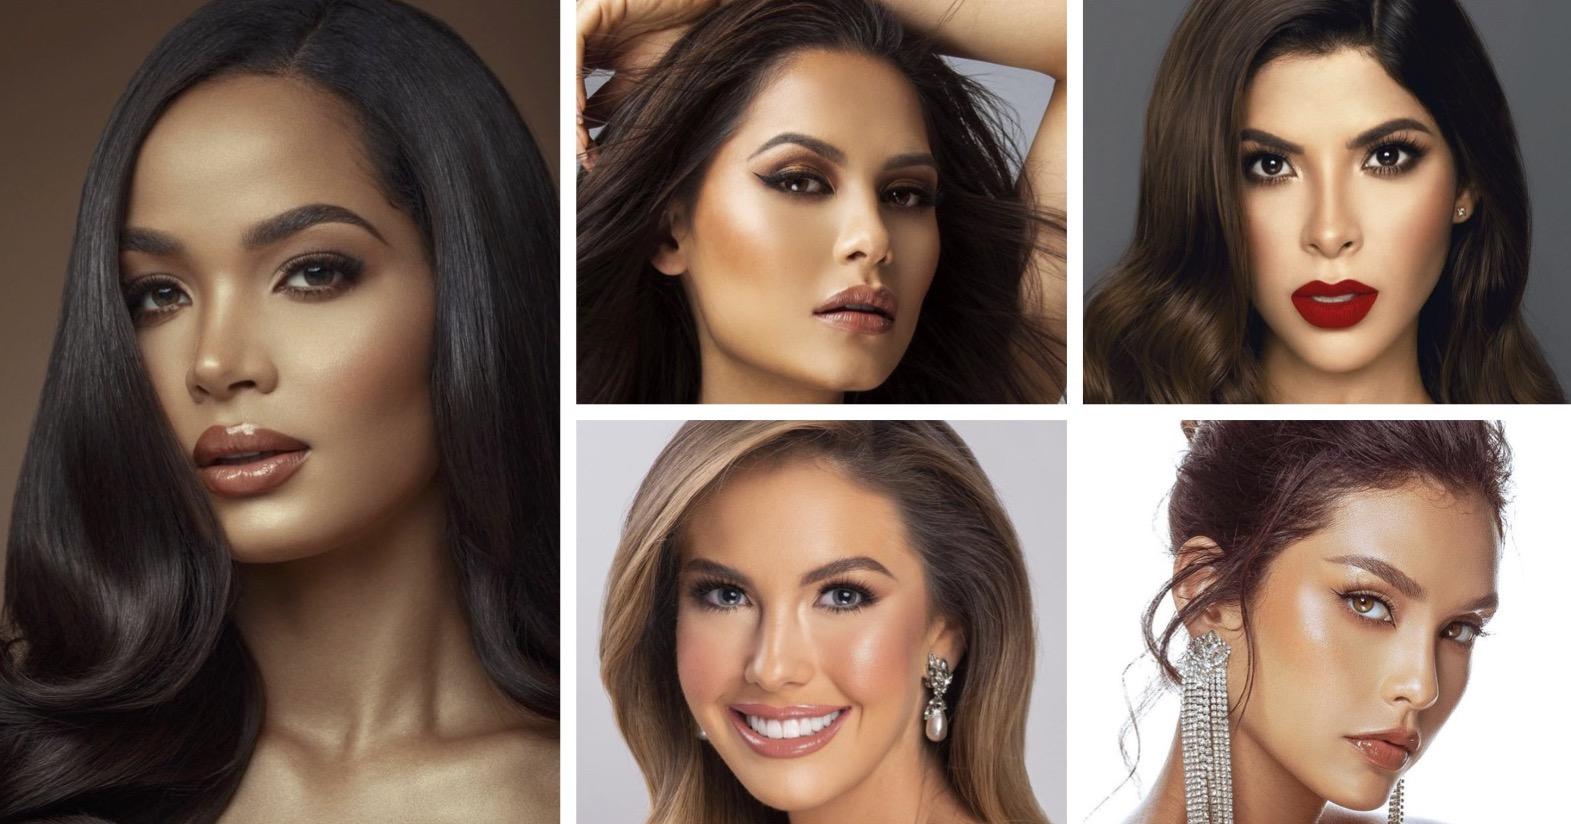 Miss Universo 2021, Miss Perú, Miss Colombia, Miss Republica Dominicana, Miss Argentina, Miss Mexico